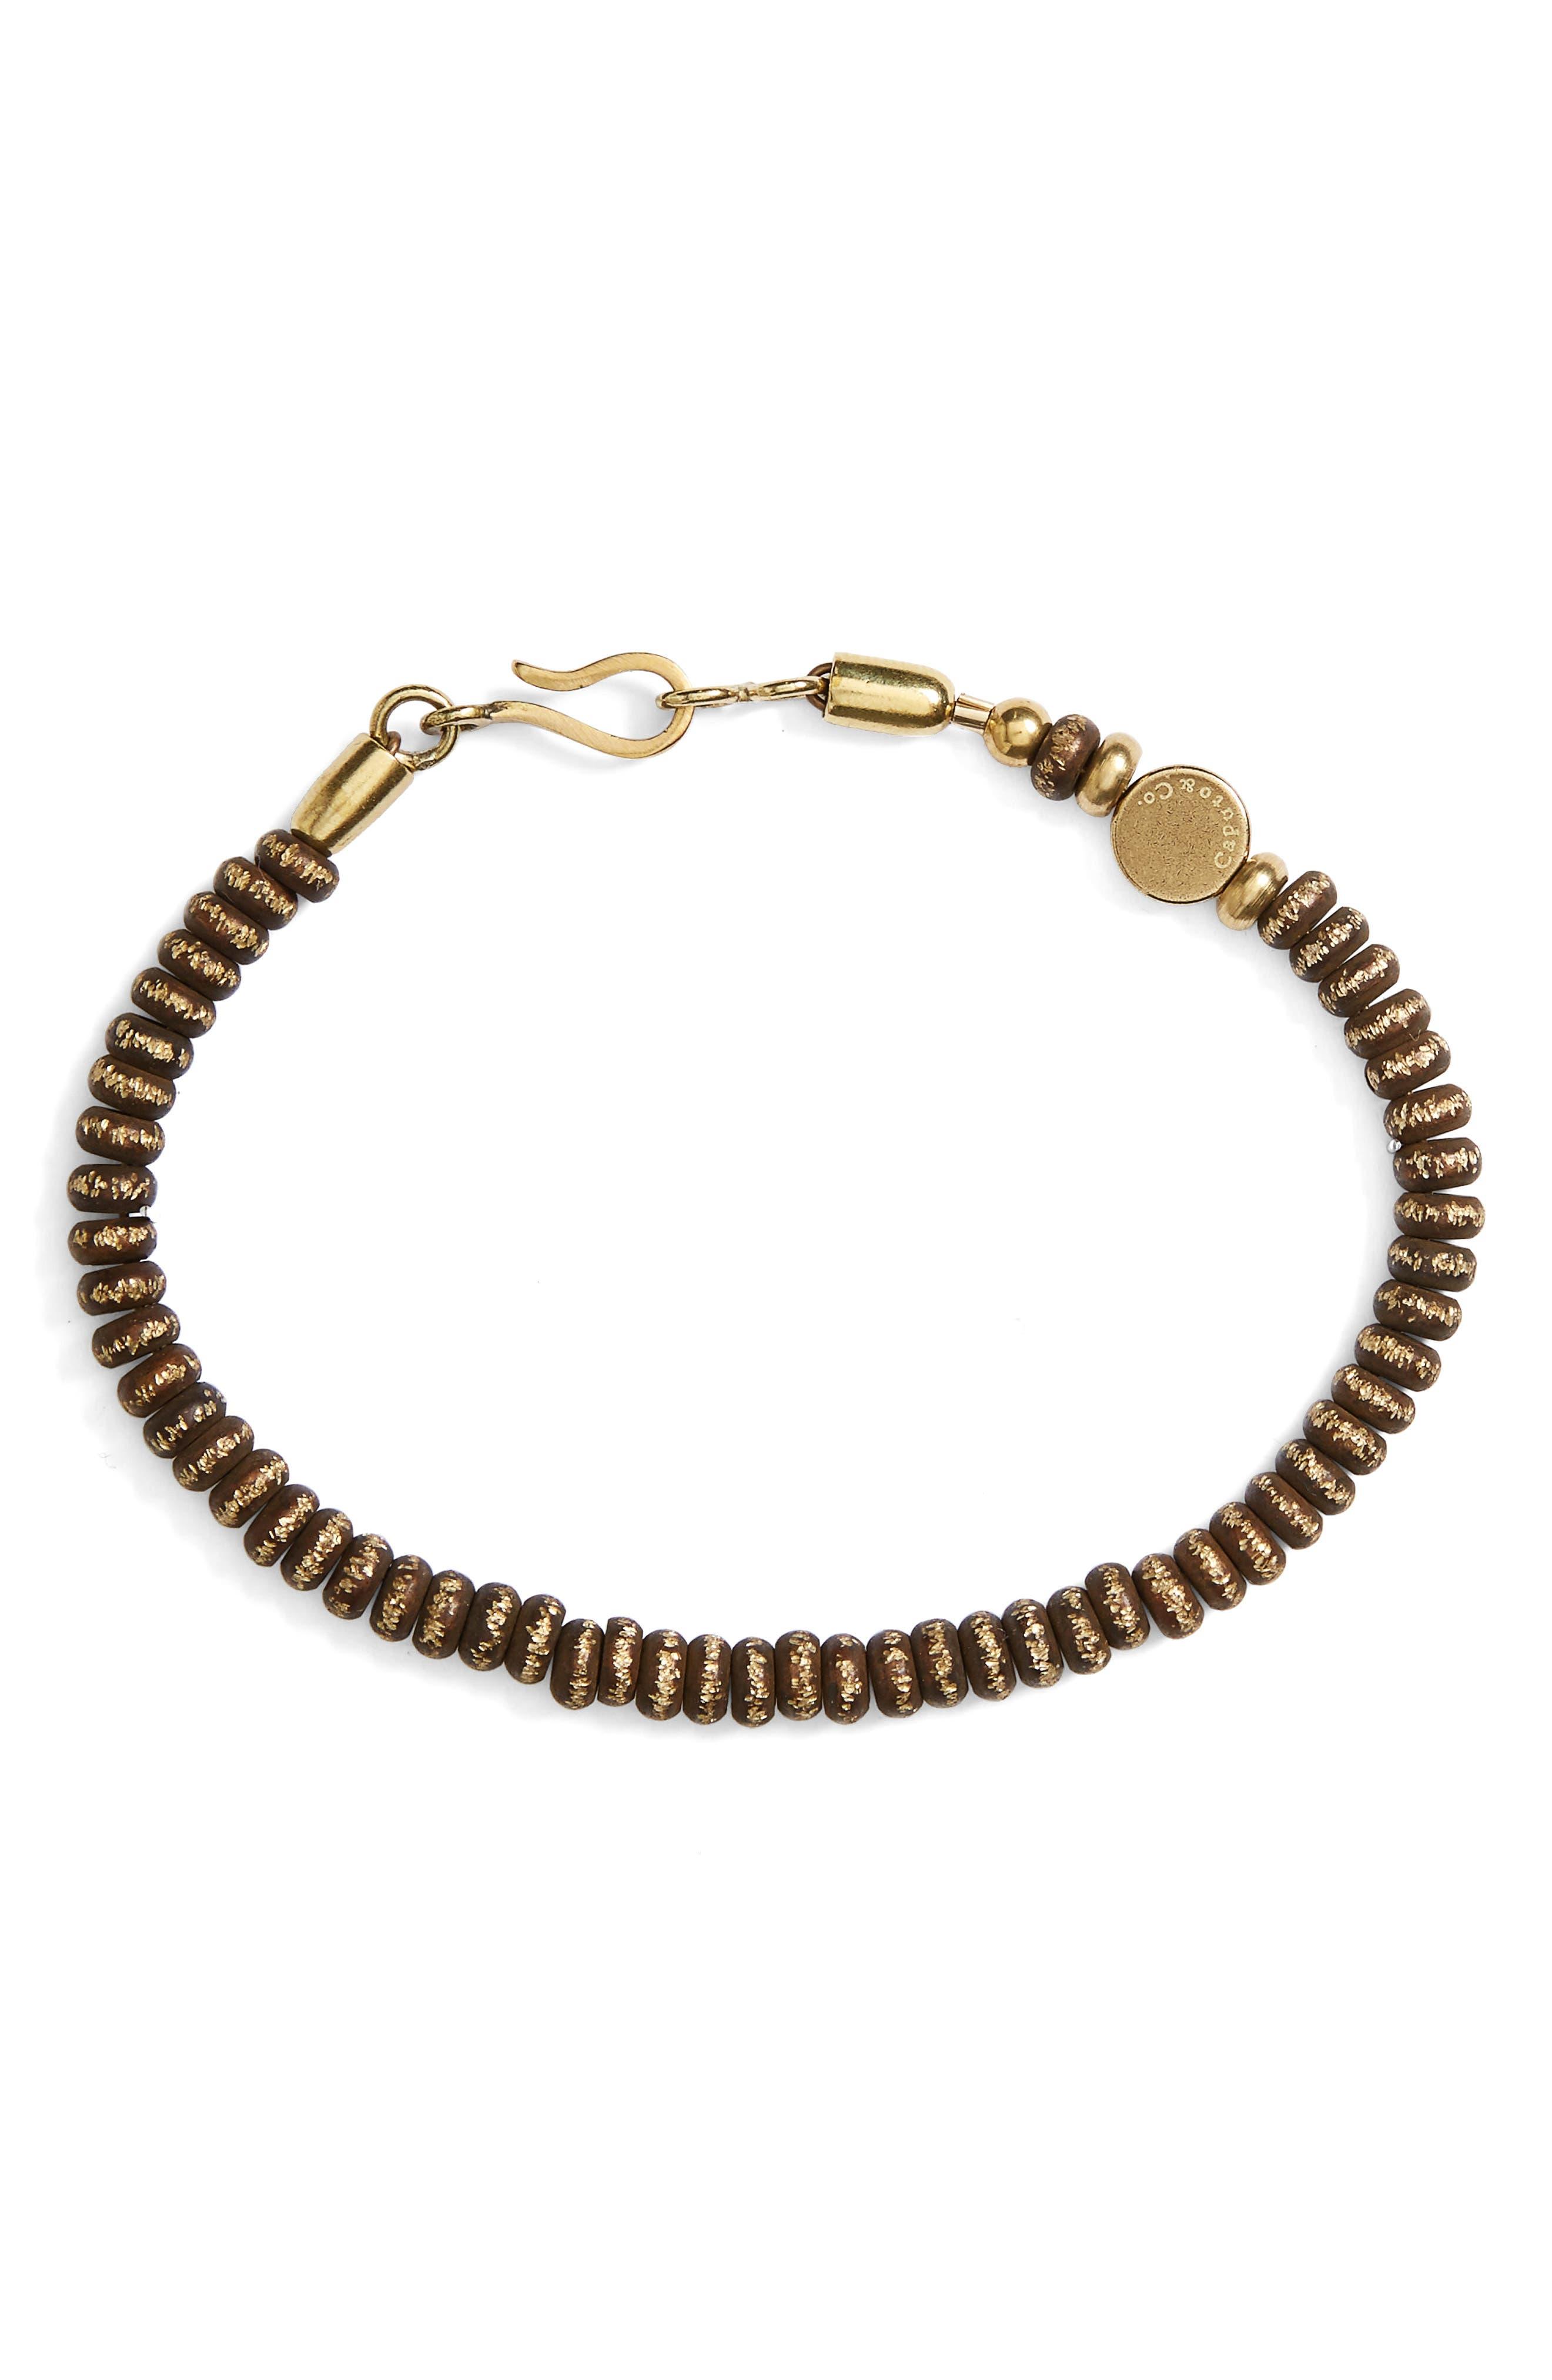 Rondelle Brass Bead Bracelet,                             Main thumbnail 1, color,                             710